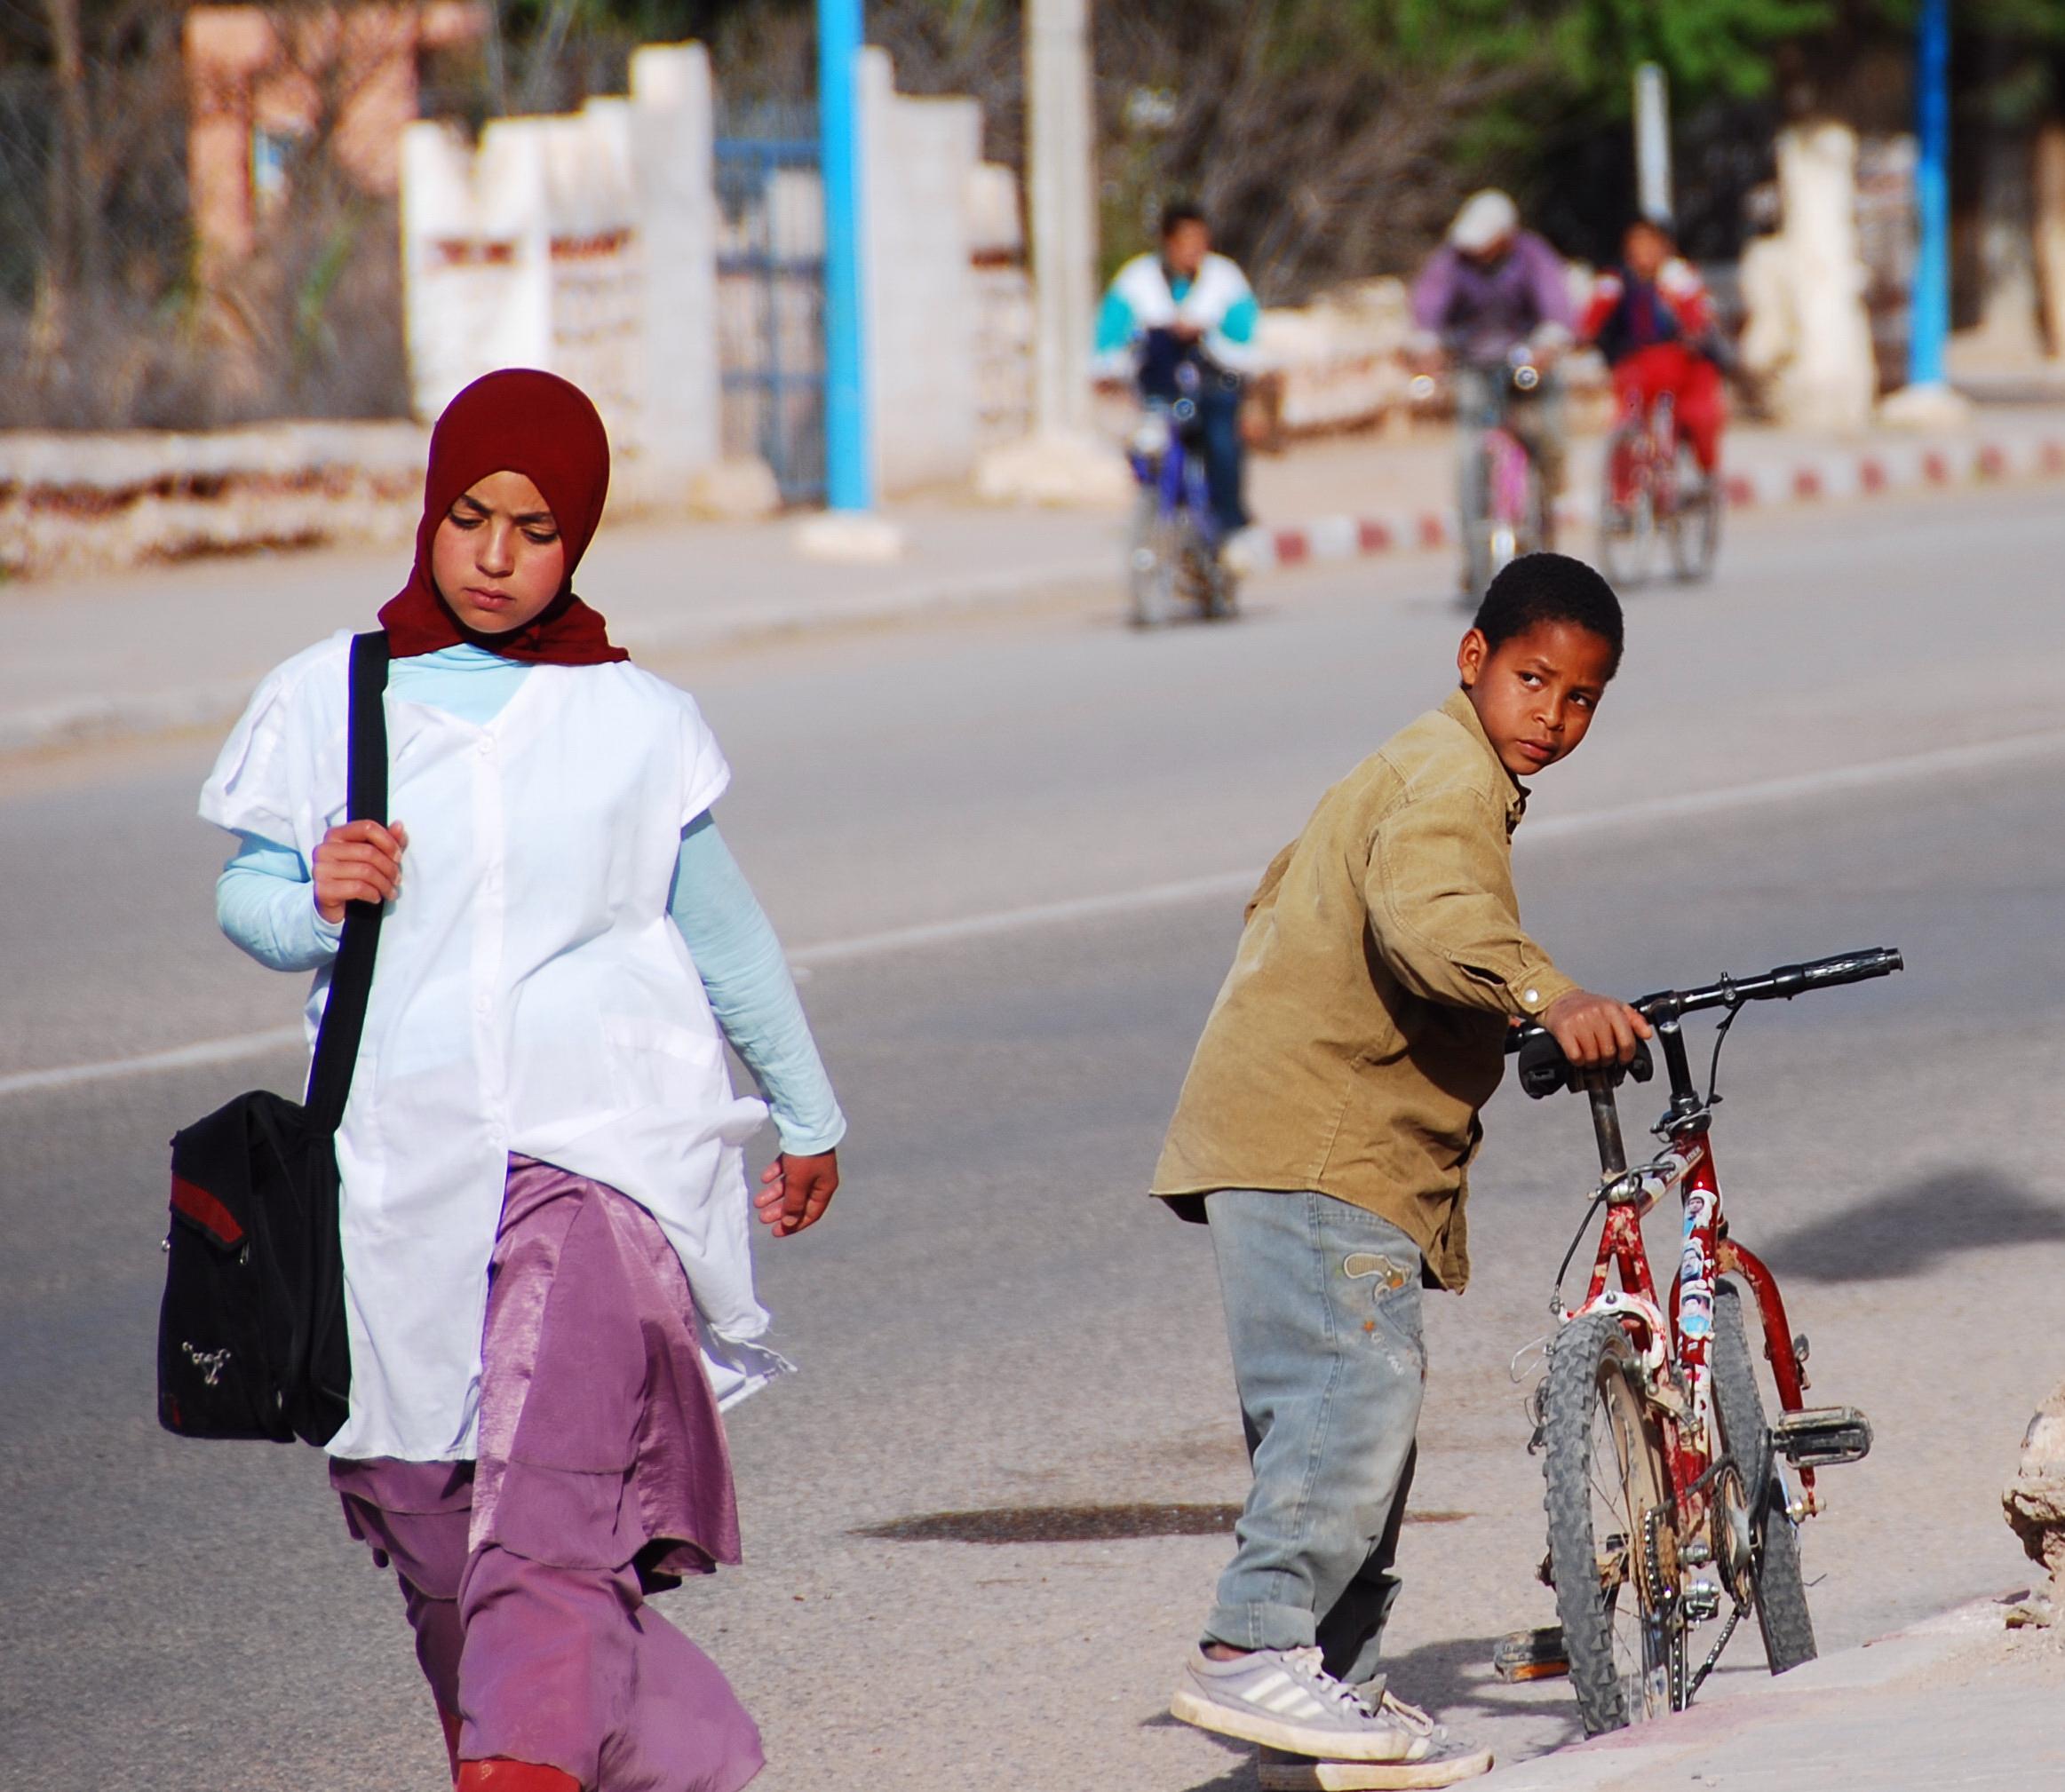 Marocco-0459.jpg